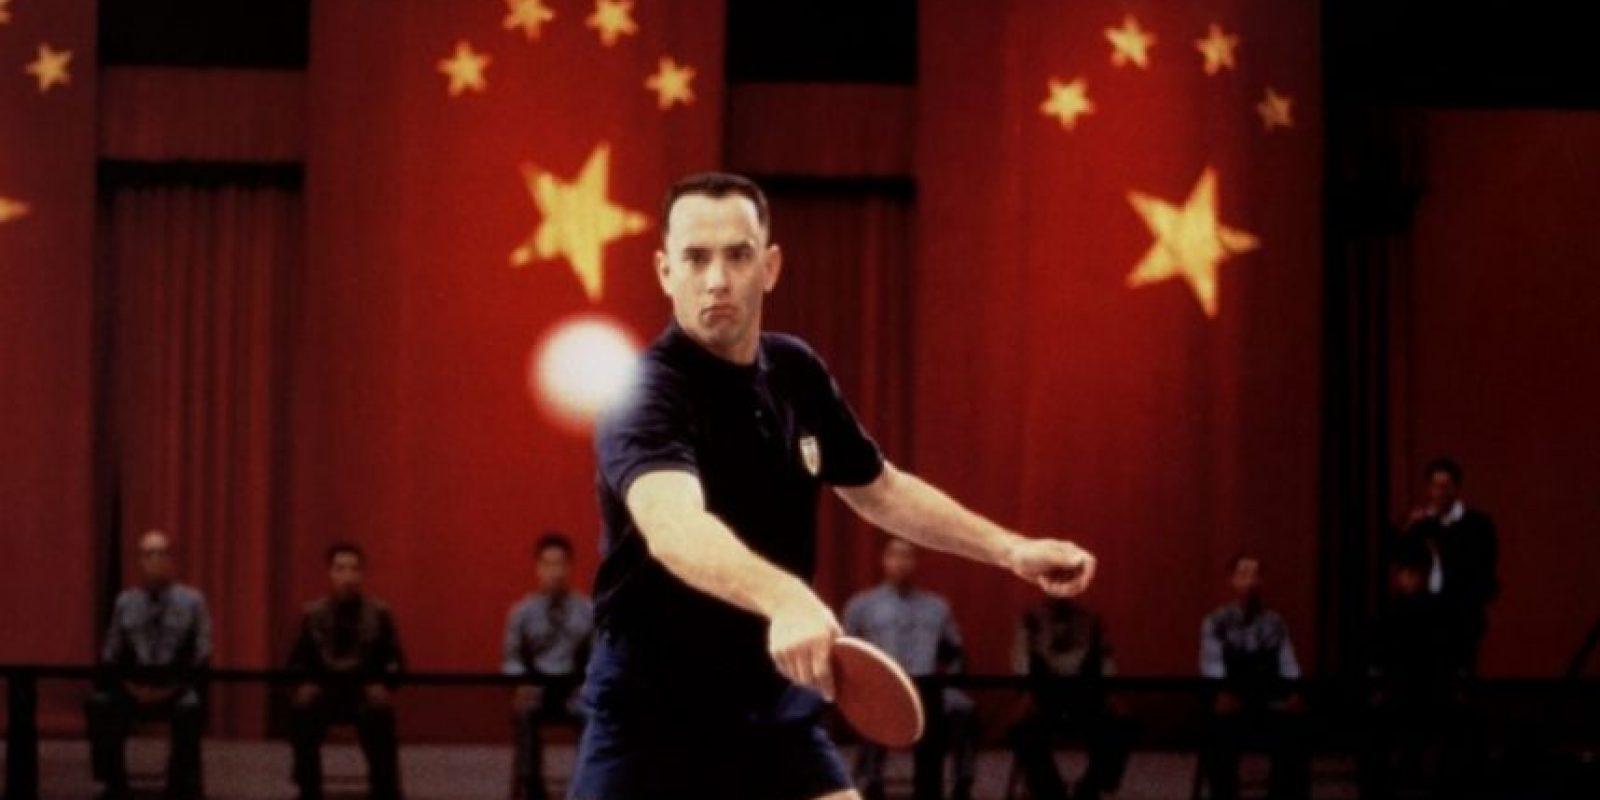 Forrest jugaba ping-pong. Por eso se hizo famoso. Foto:vía Paramount Pictures